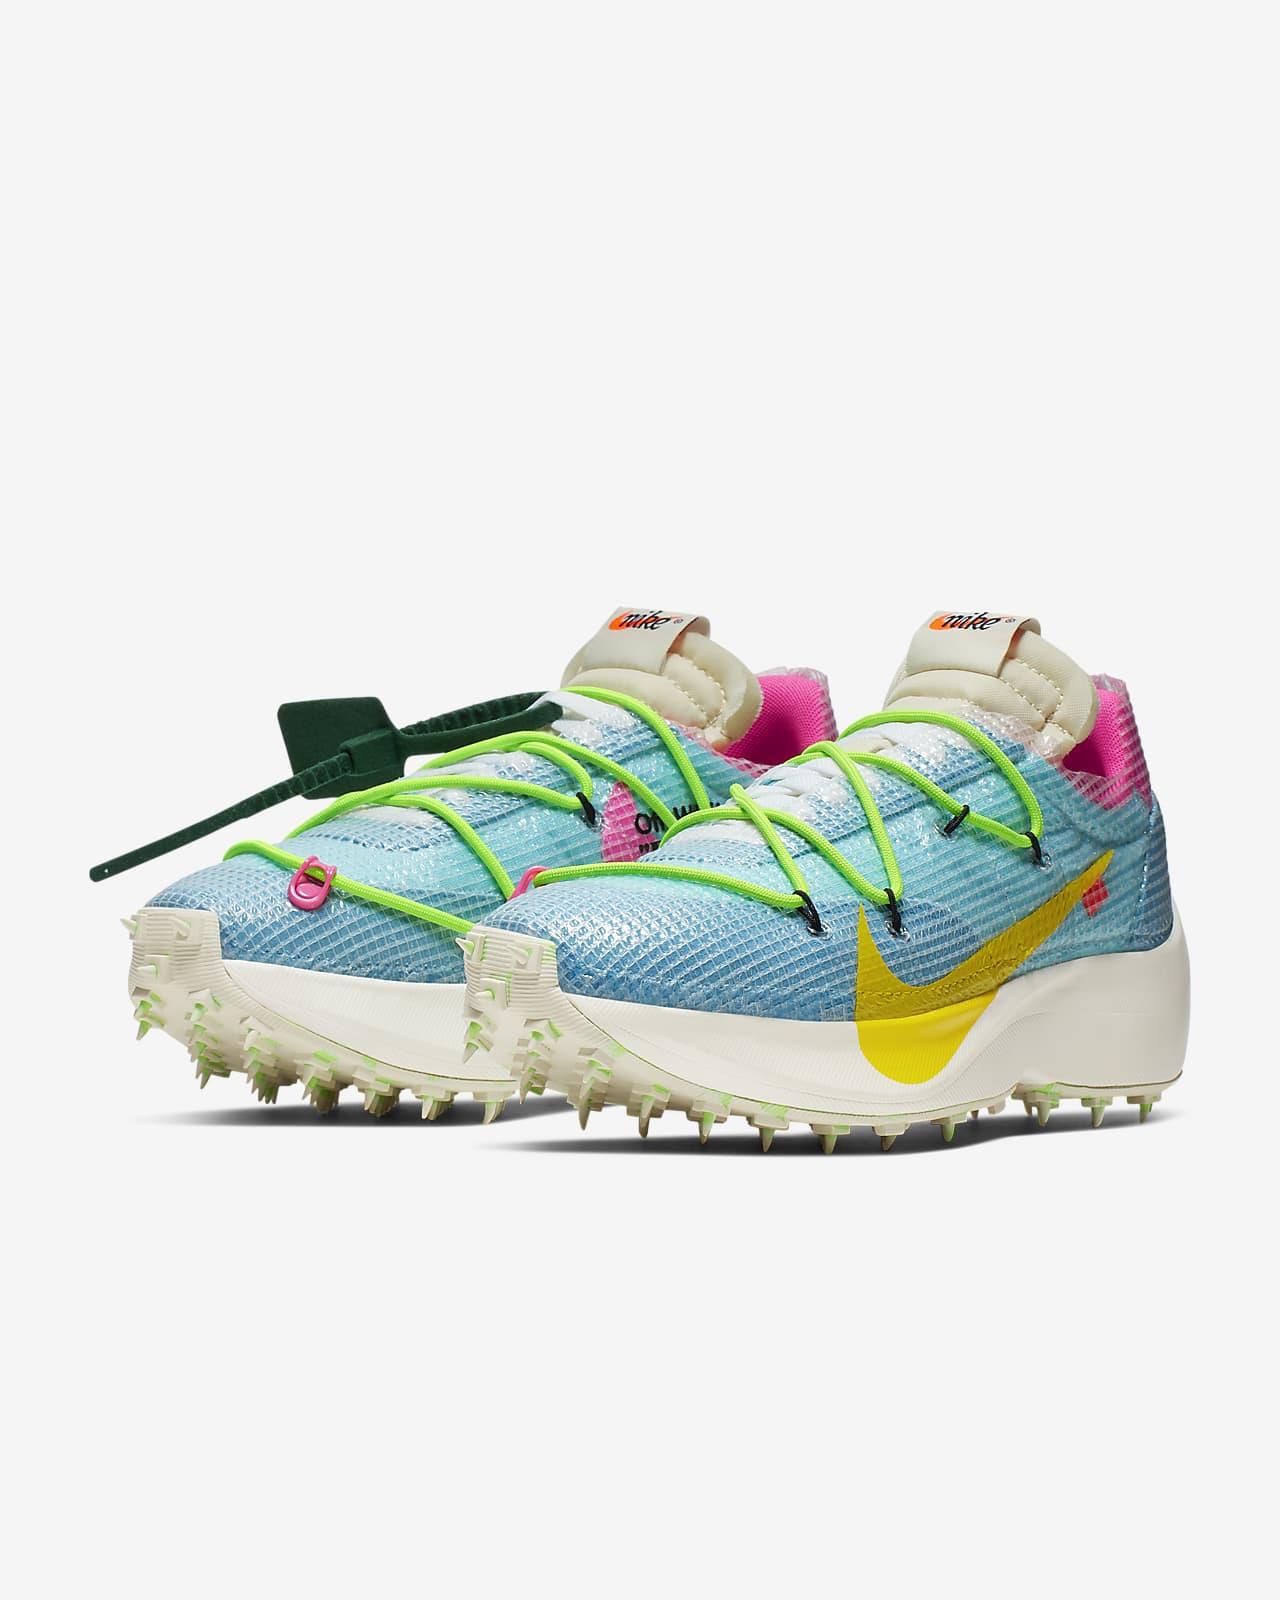 Nike x Off-White™ Vapor Street Women's